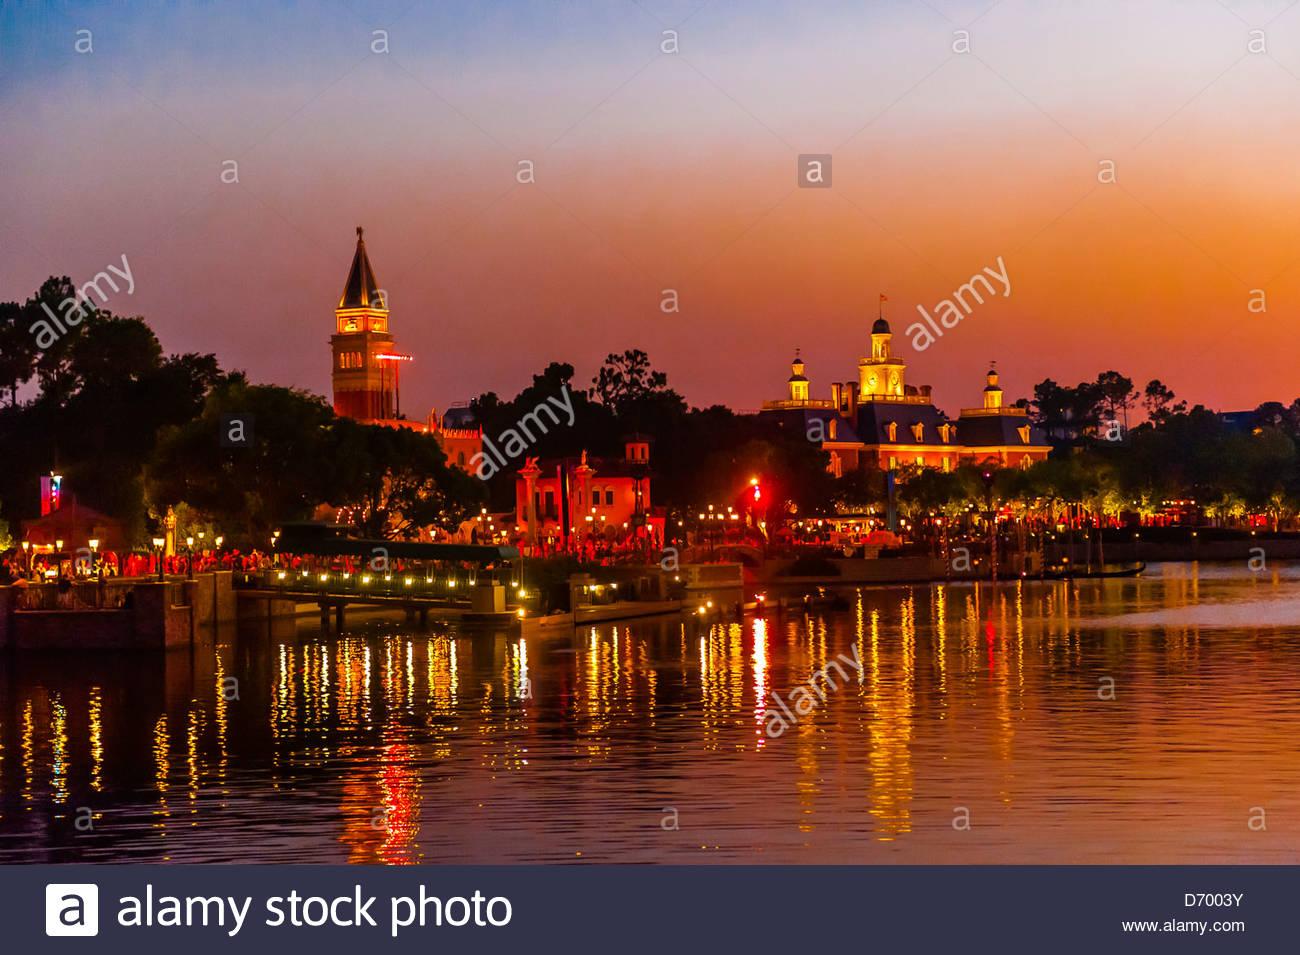 Italy pavilion and the American Adventure, World Showcase, Epcot, Walt Disney World, Orlando, Florida USA - Stock Image